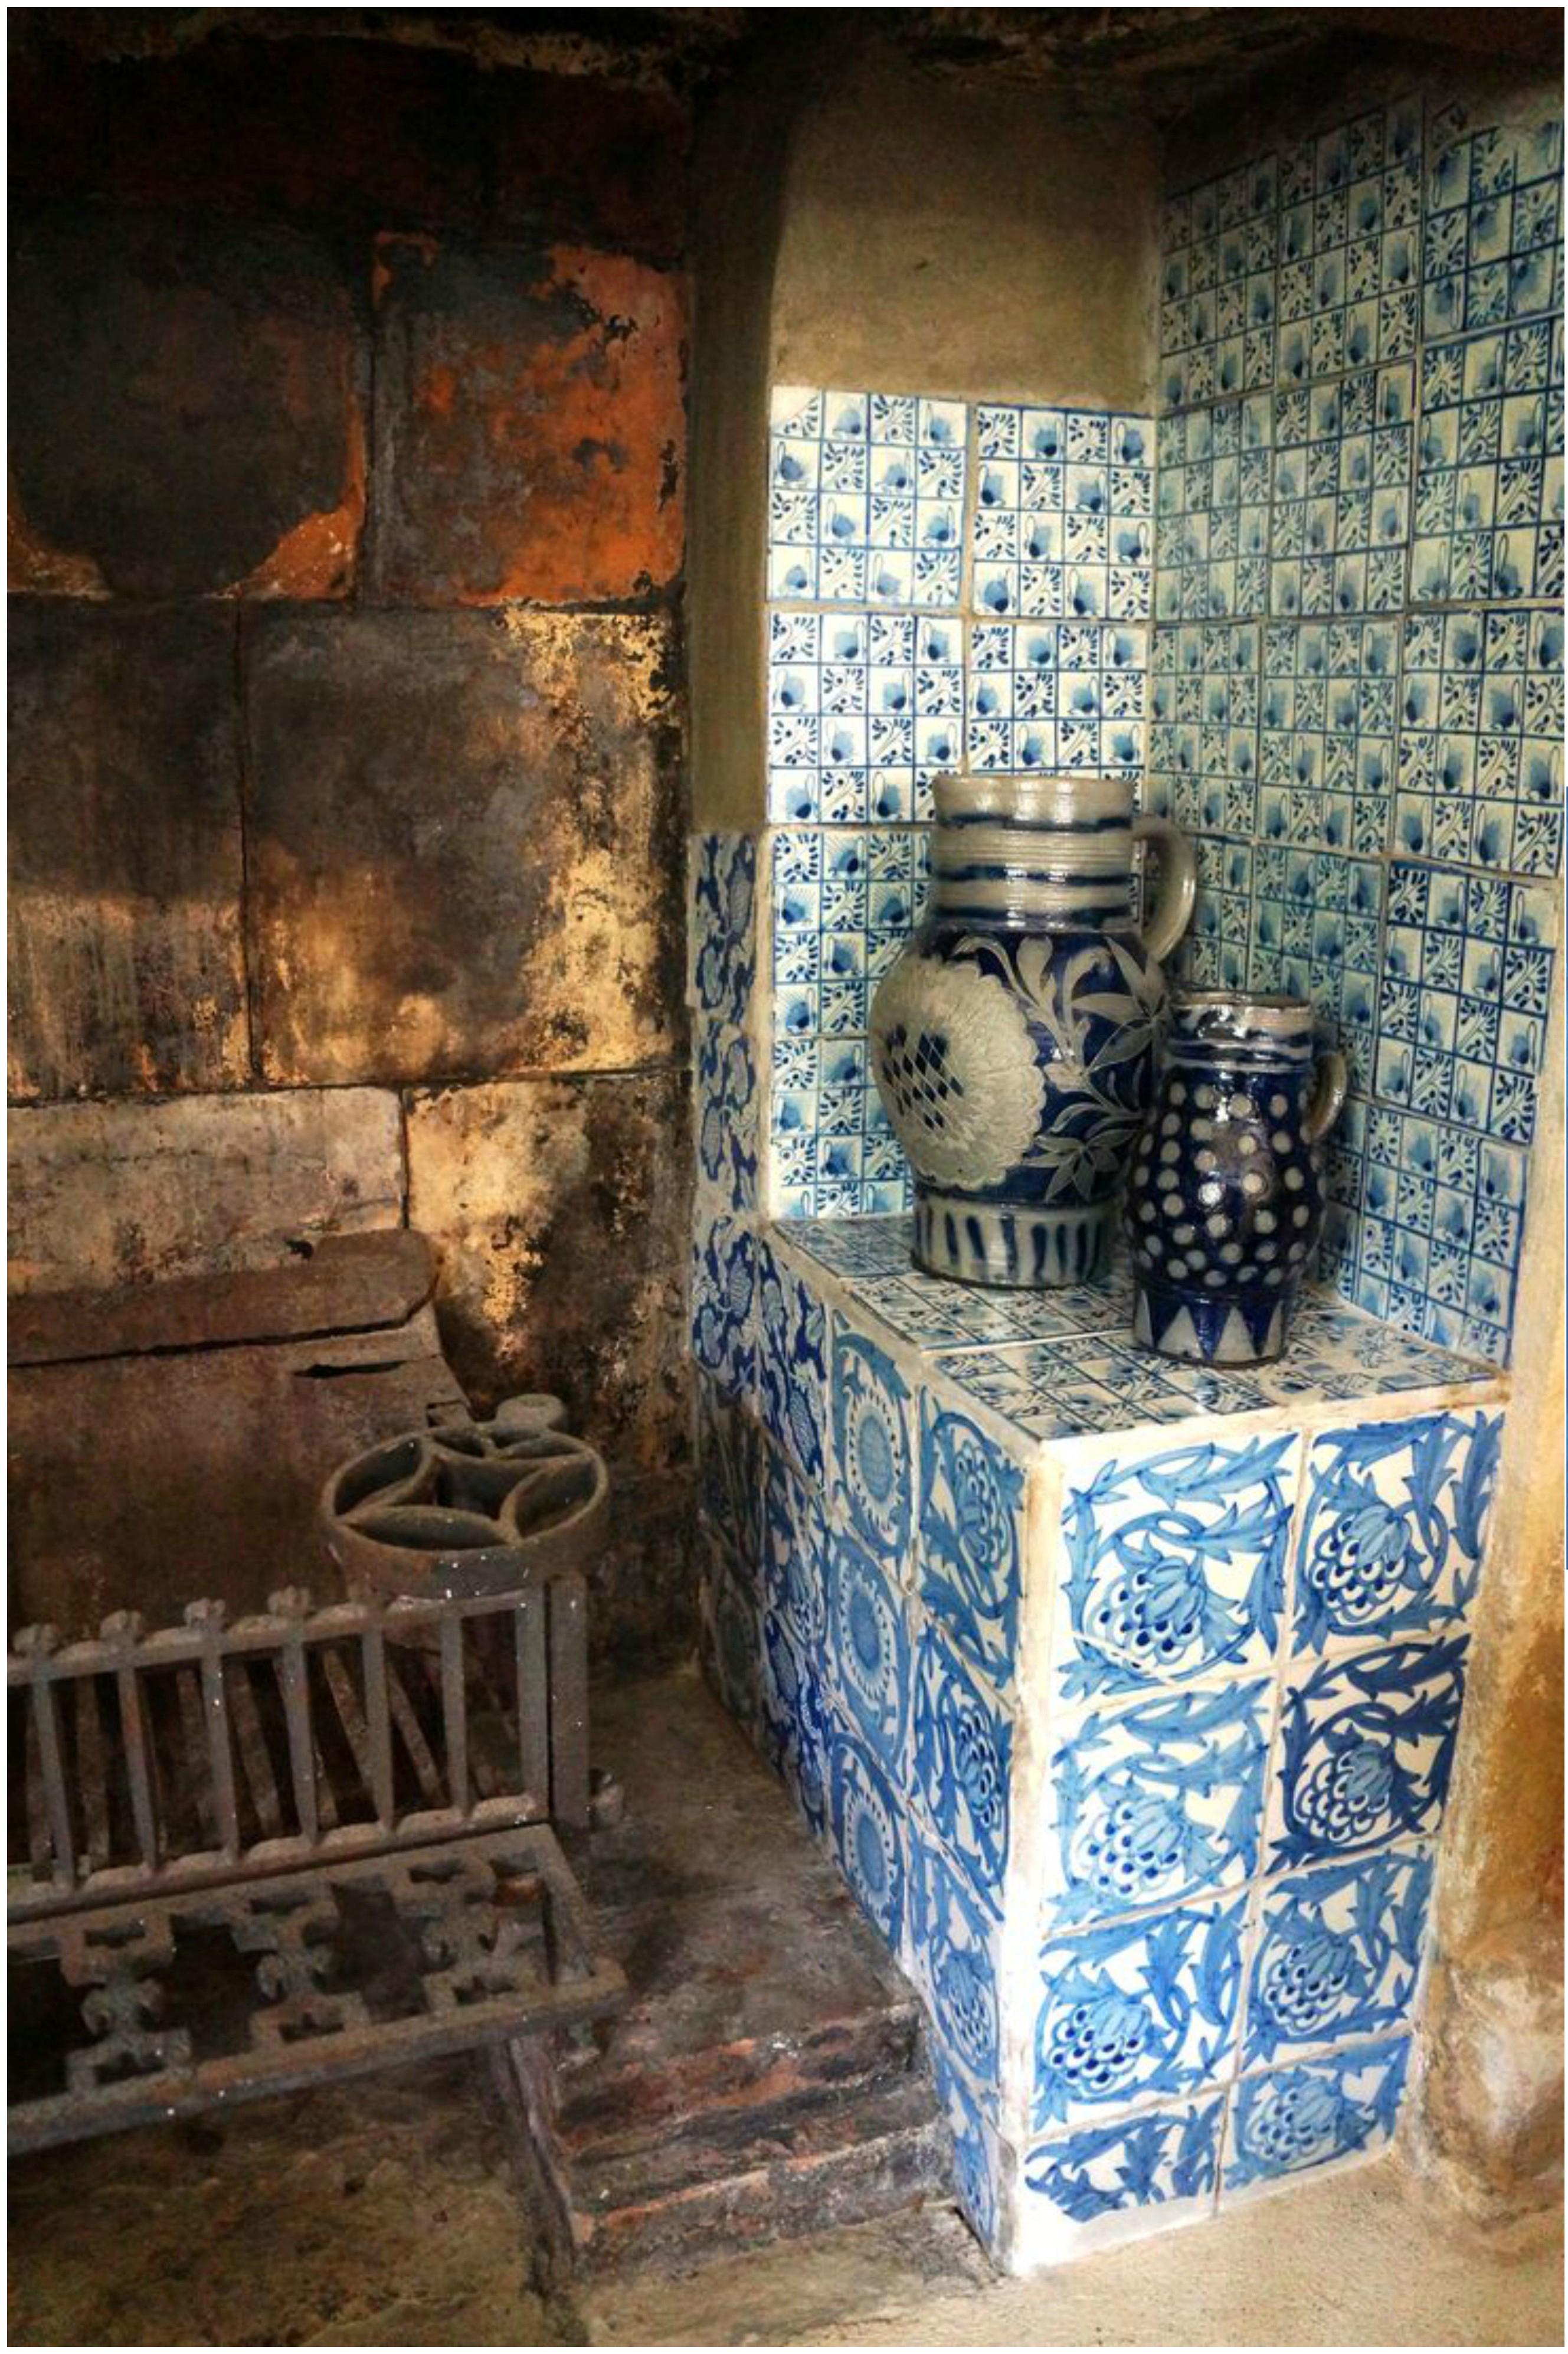 Kelmscott Manor, Green Room Fireplace